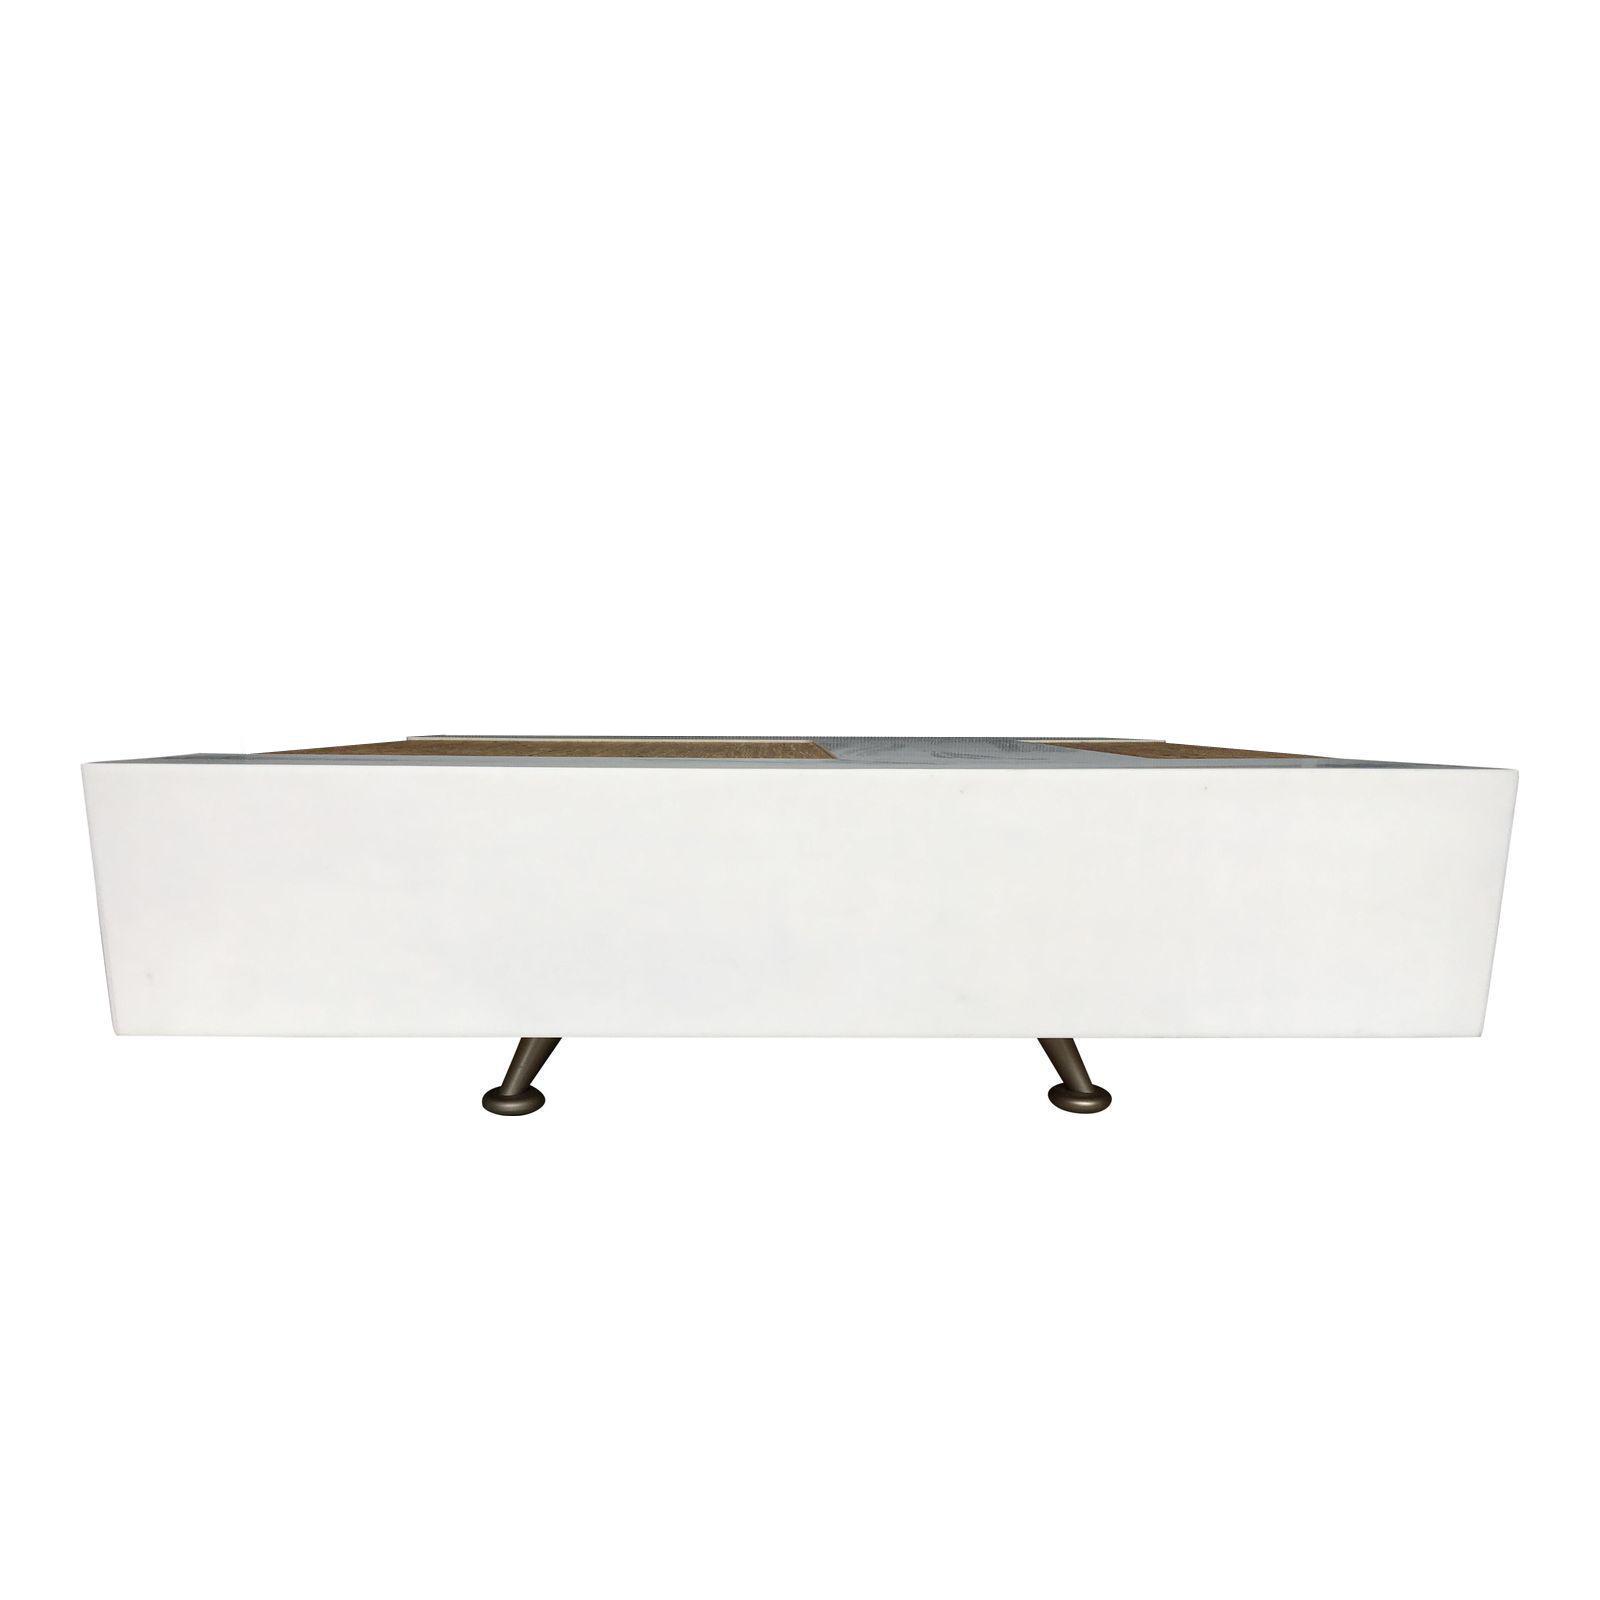 Dune Modern White Plastic And Bamboo Coffee Table Chairish